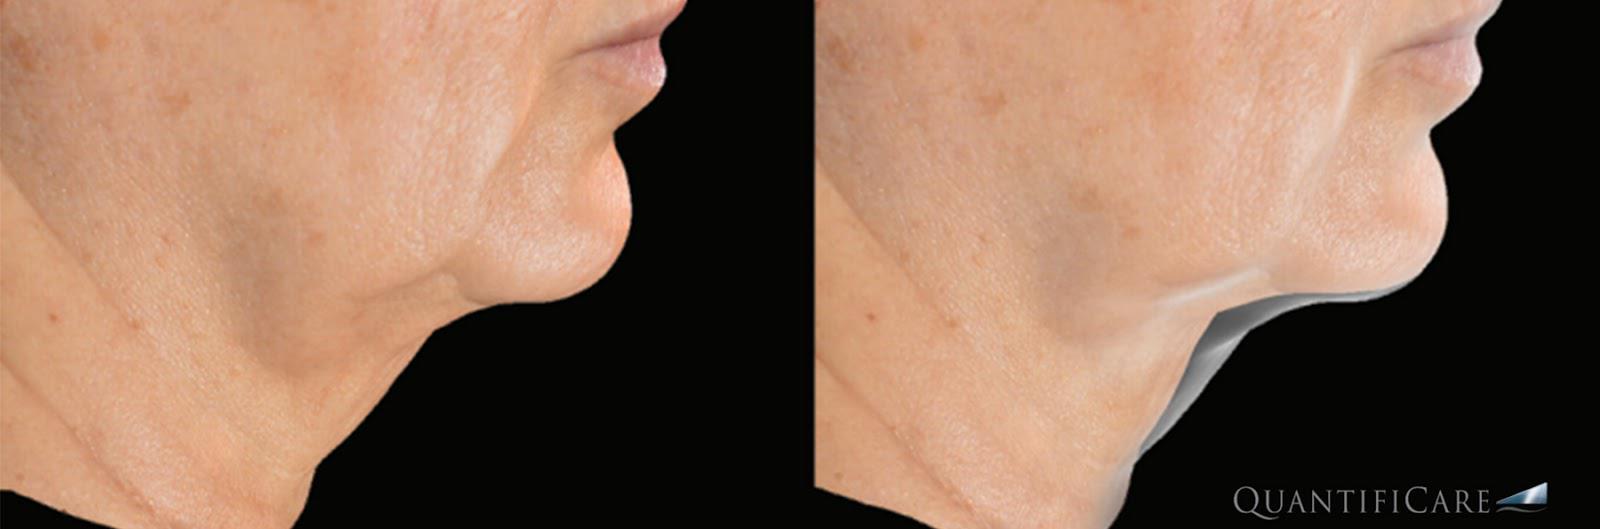 3d照相机医美纪录案例照玻尿酸肉毒隆乳手术魔滴模拟抽脂手术模拟